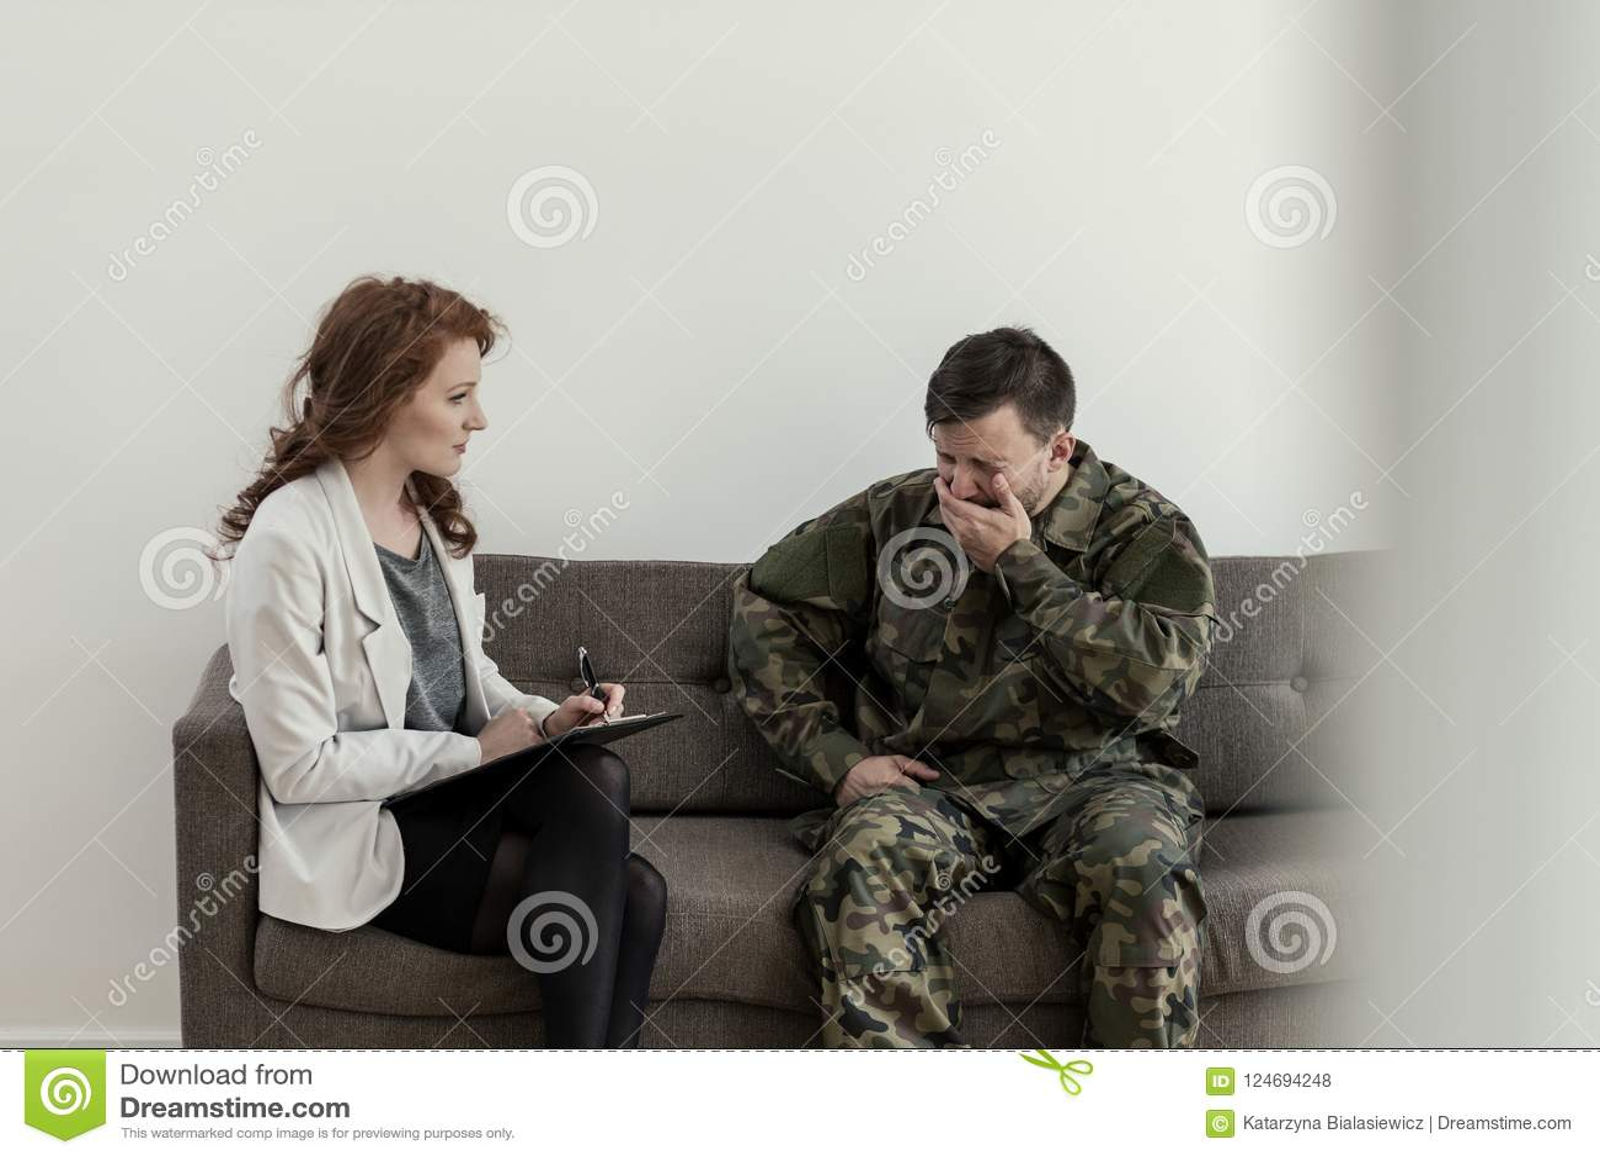 Плача солдат в зеленой форме во время консультации с психологом